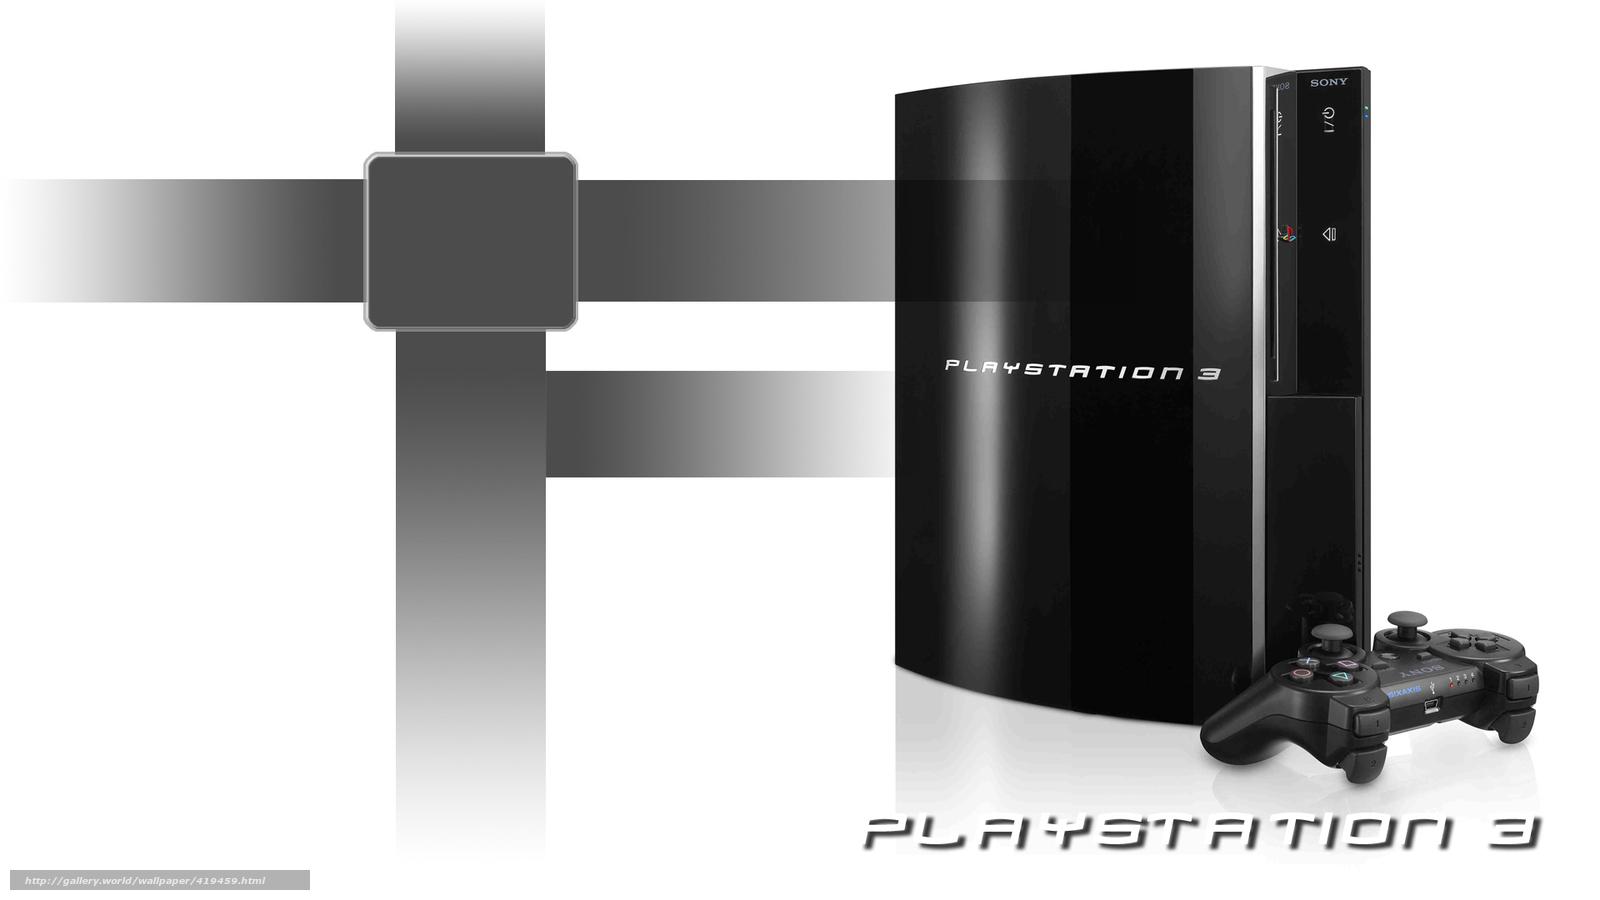 Tlcharger fond d 39 ecran noir manche balai playstation 3 for Fond ecran ps3